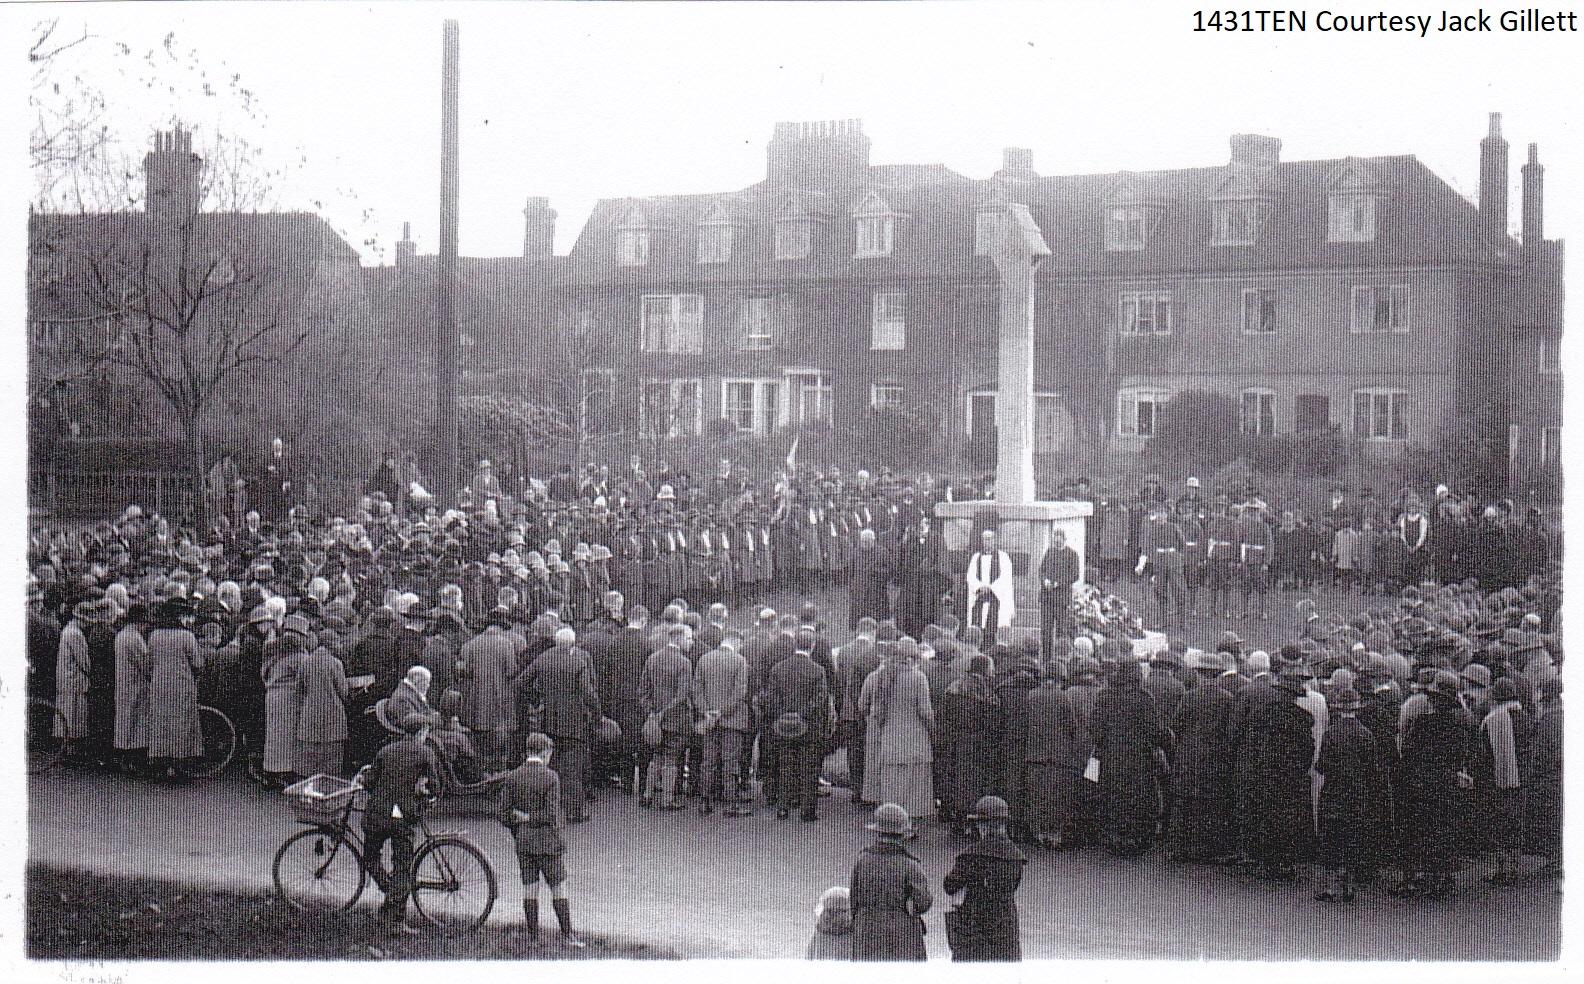 Unveiling of the War Memorial